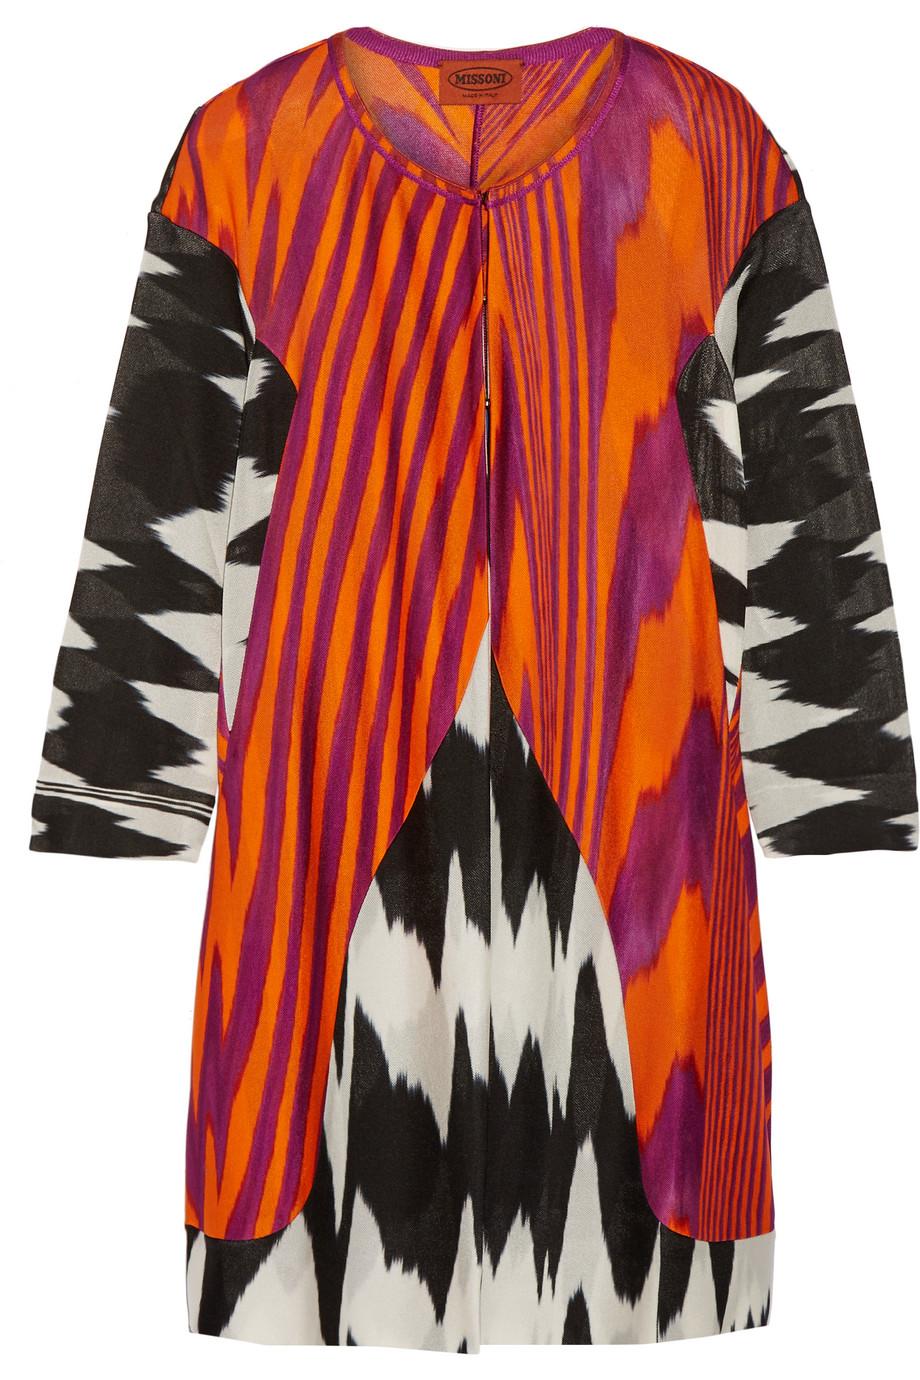 Missoni Crochet-Knit Cardigan, Orange, Women's, Size: 36